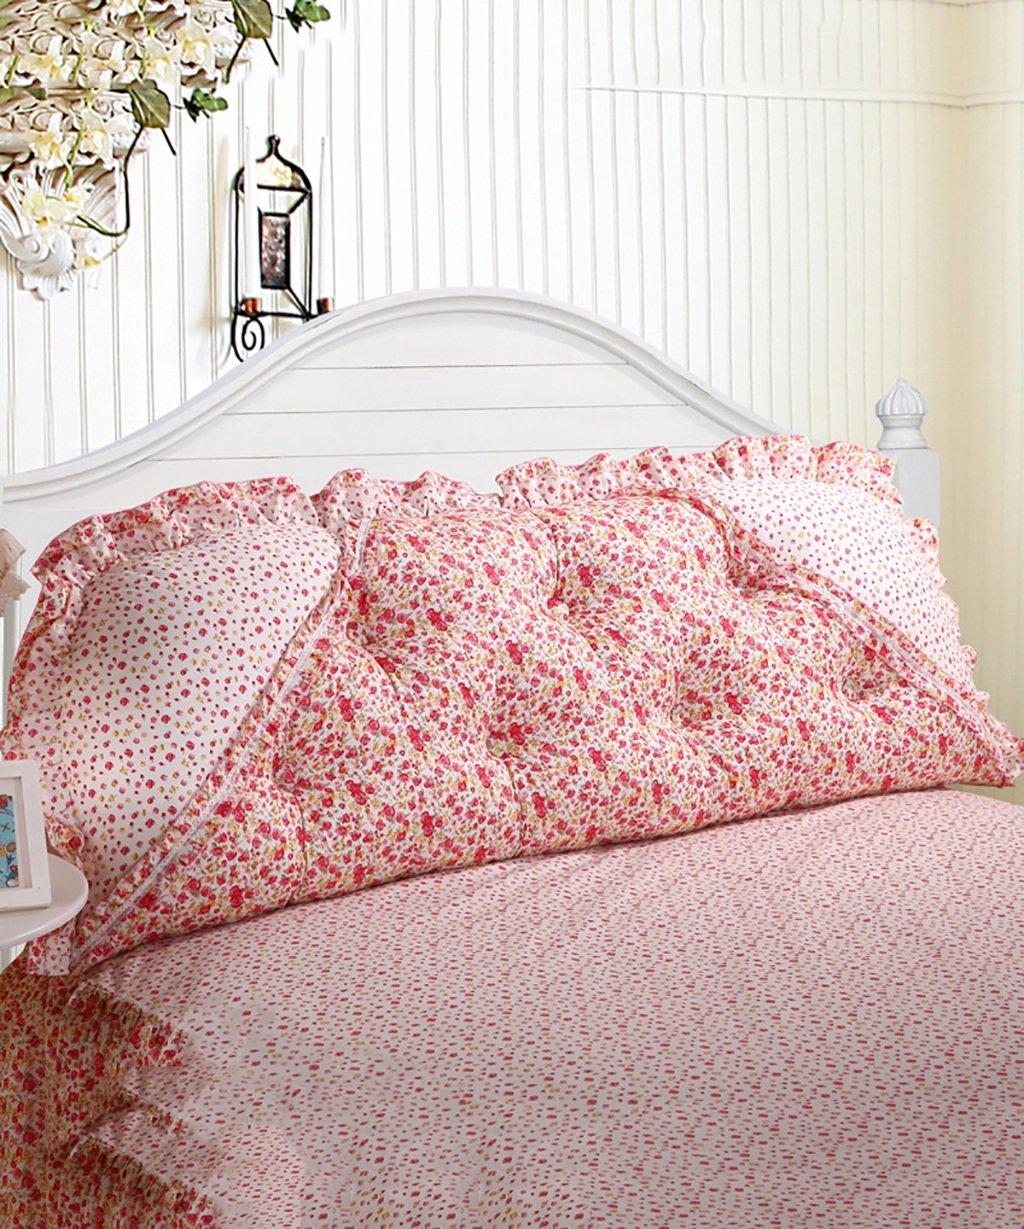 ZEMIN クッション ベッドの背もたれ ヘッドボード バック 綿のベッドサイドクッションベッドソファの枕脱着可能なPPの綿のバックルの腰の枕大きなサイズ ( 色 : #5 , サイズ さいず : 115*50cm ) B07BFM3MPY 115*50cm|#5 #5 115*50cm